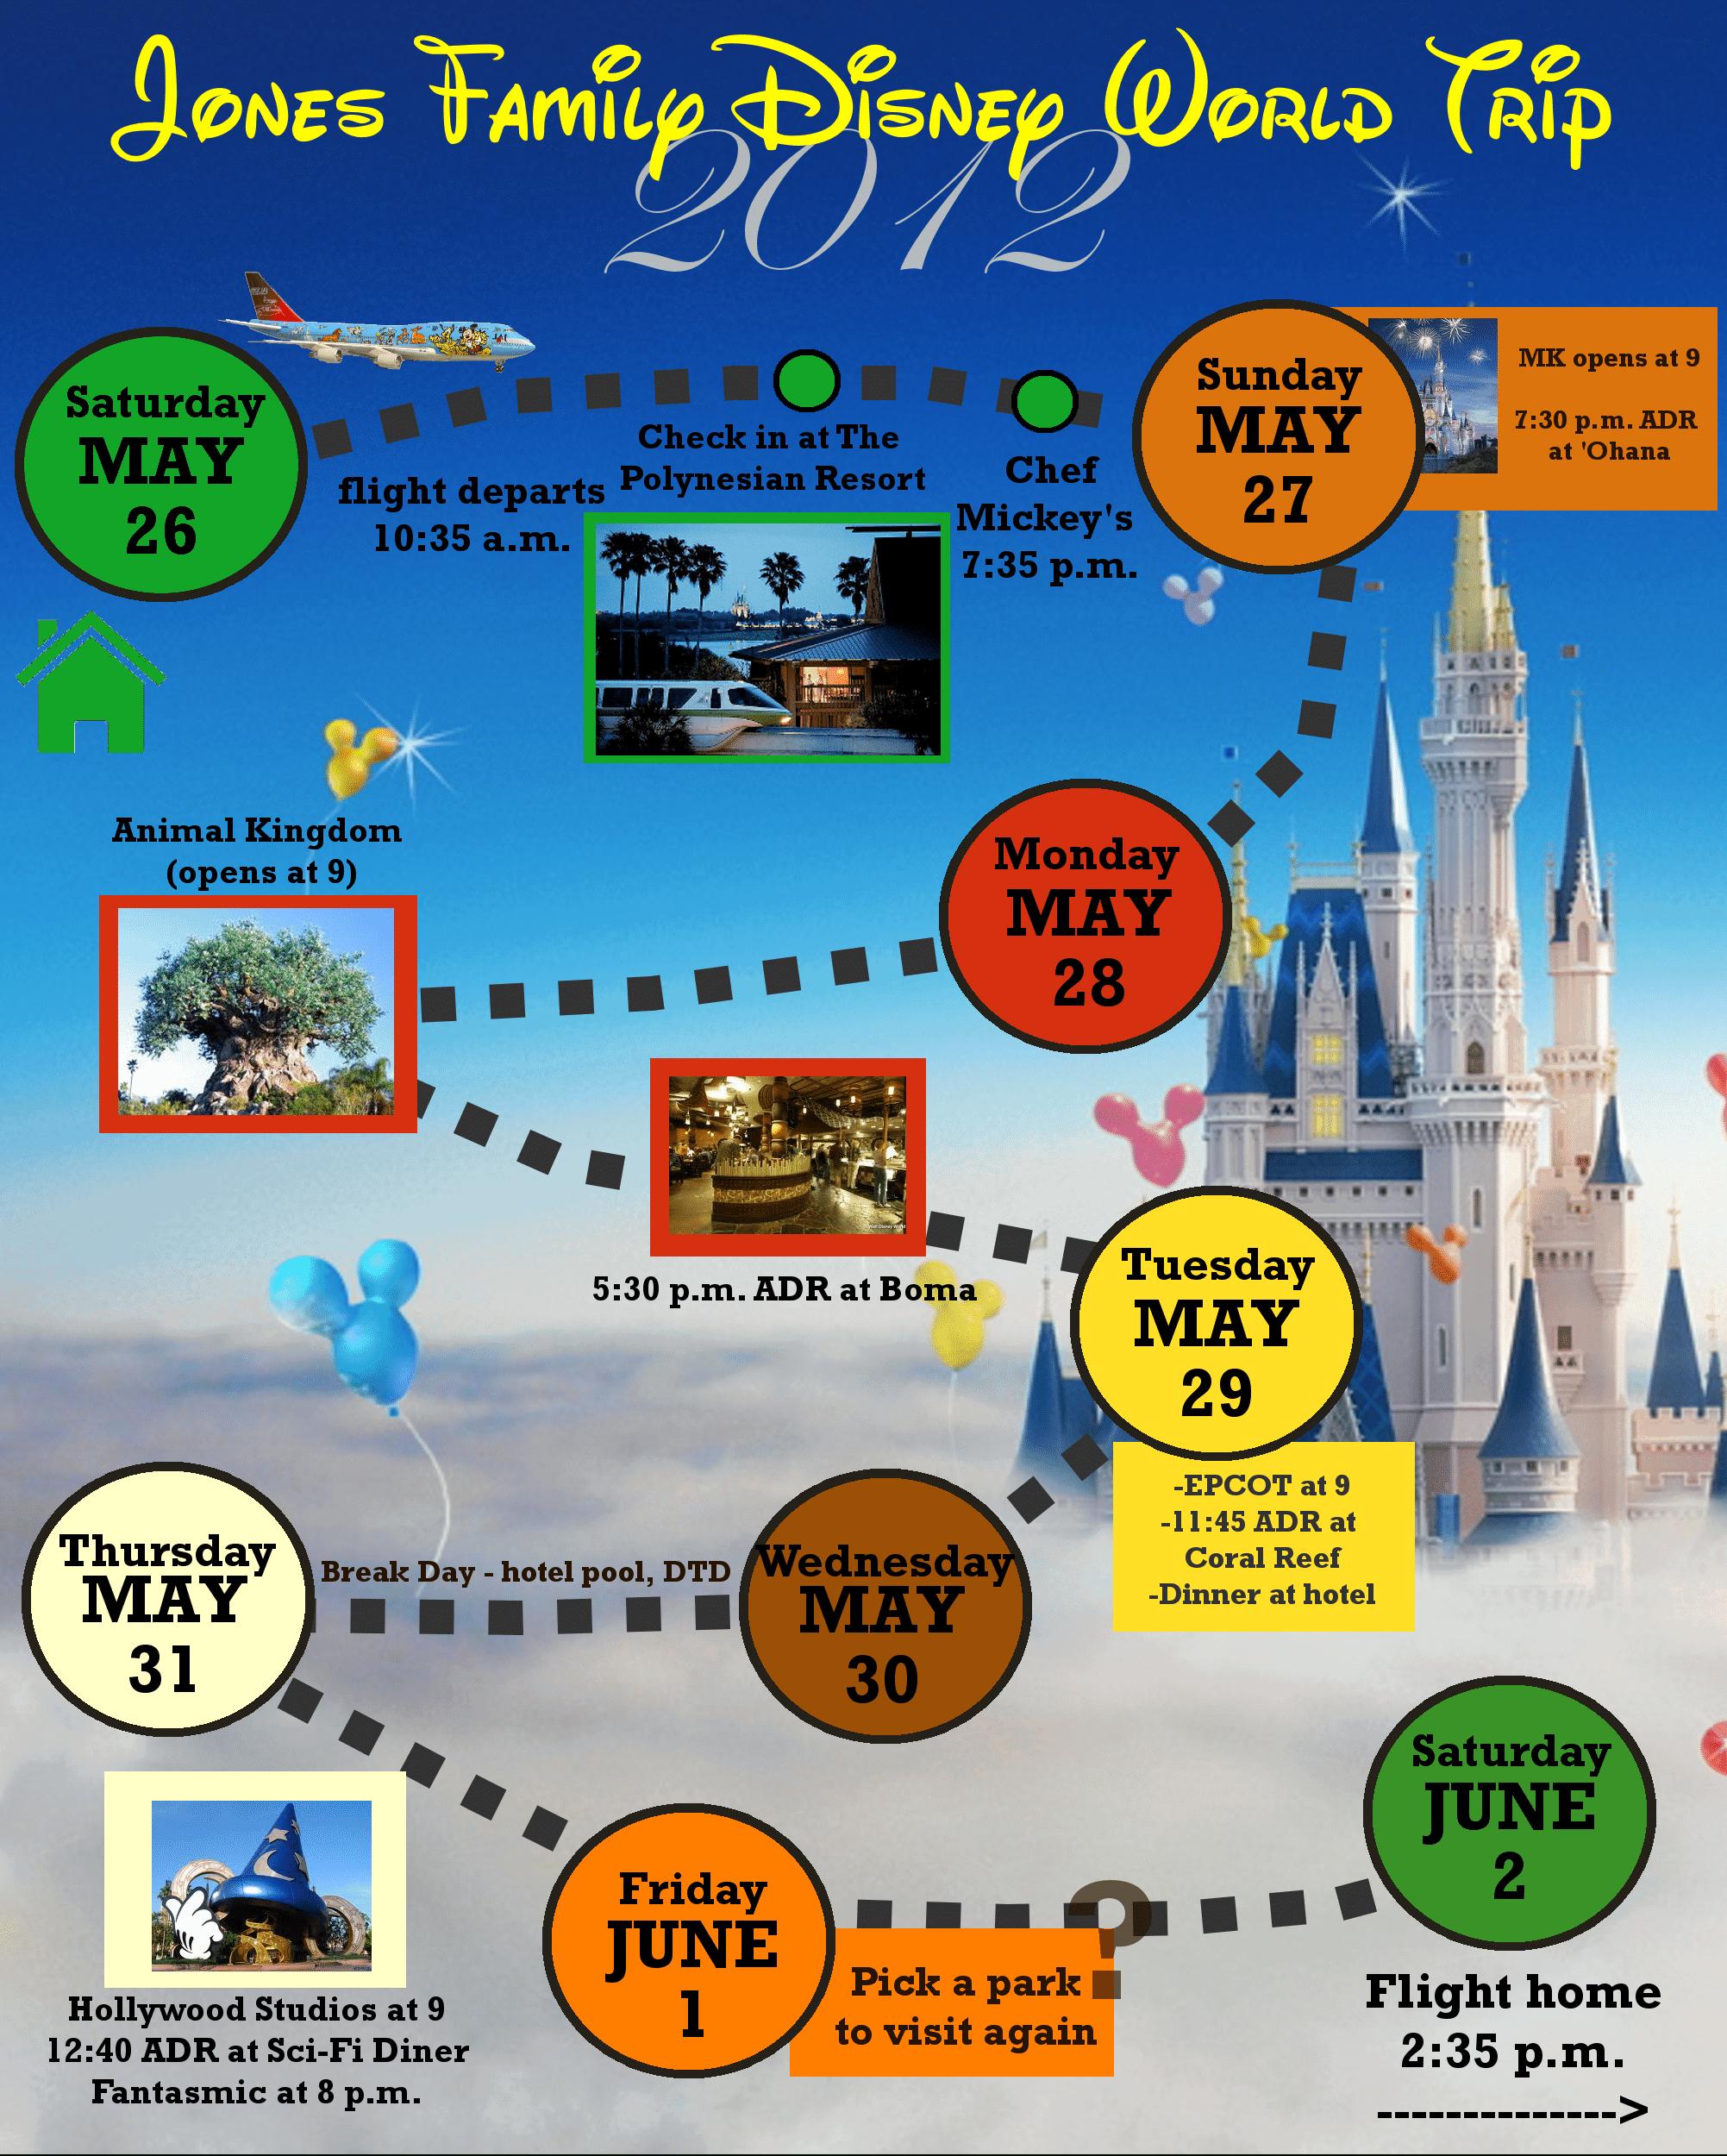 2 Custom Disney World Itinerary Templates | Wdw Prep School with regard to Disney World Itinerary Template